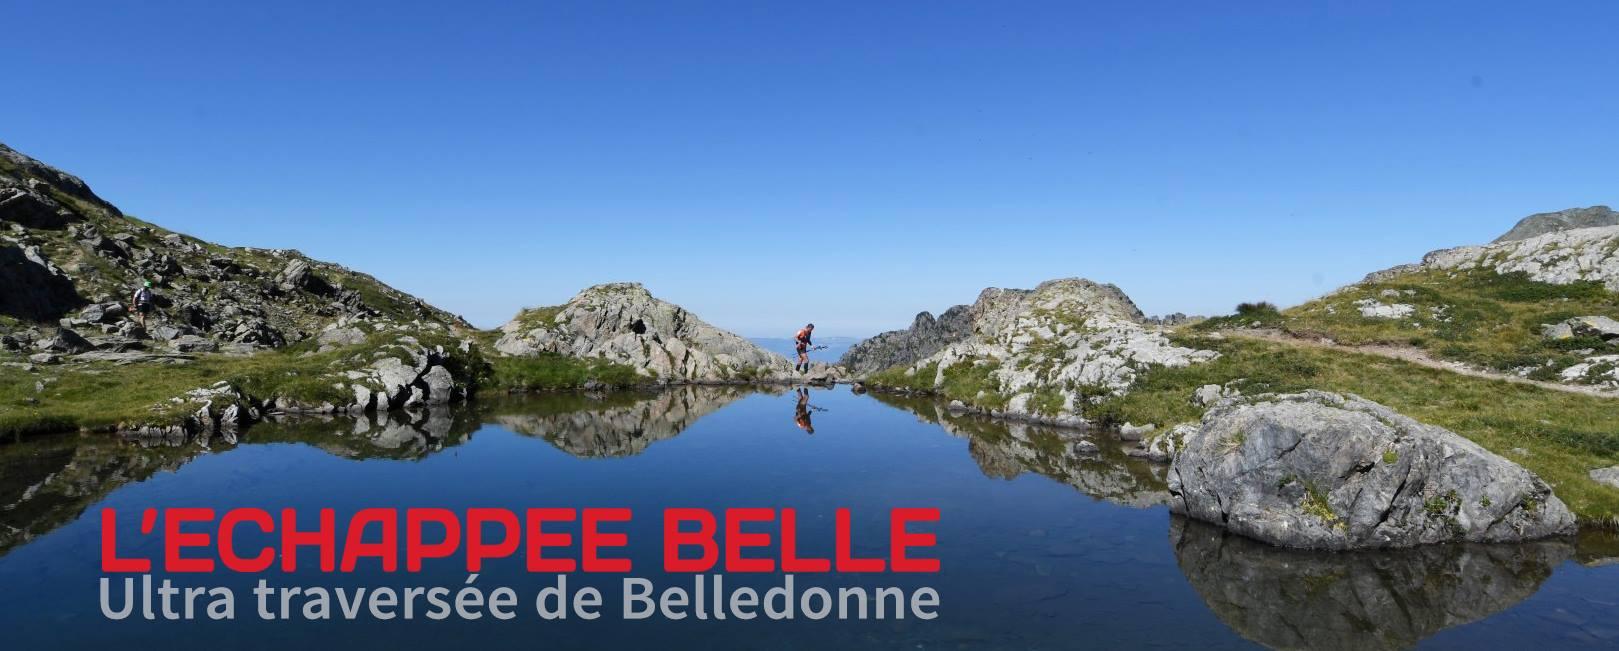 Photo trail echapee belle